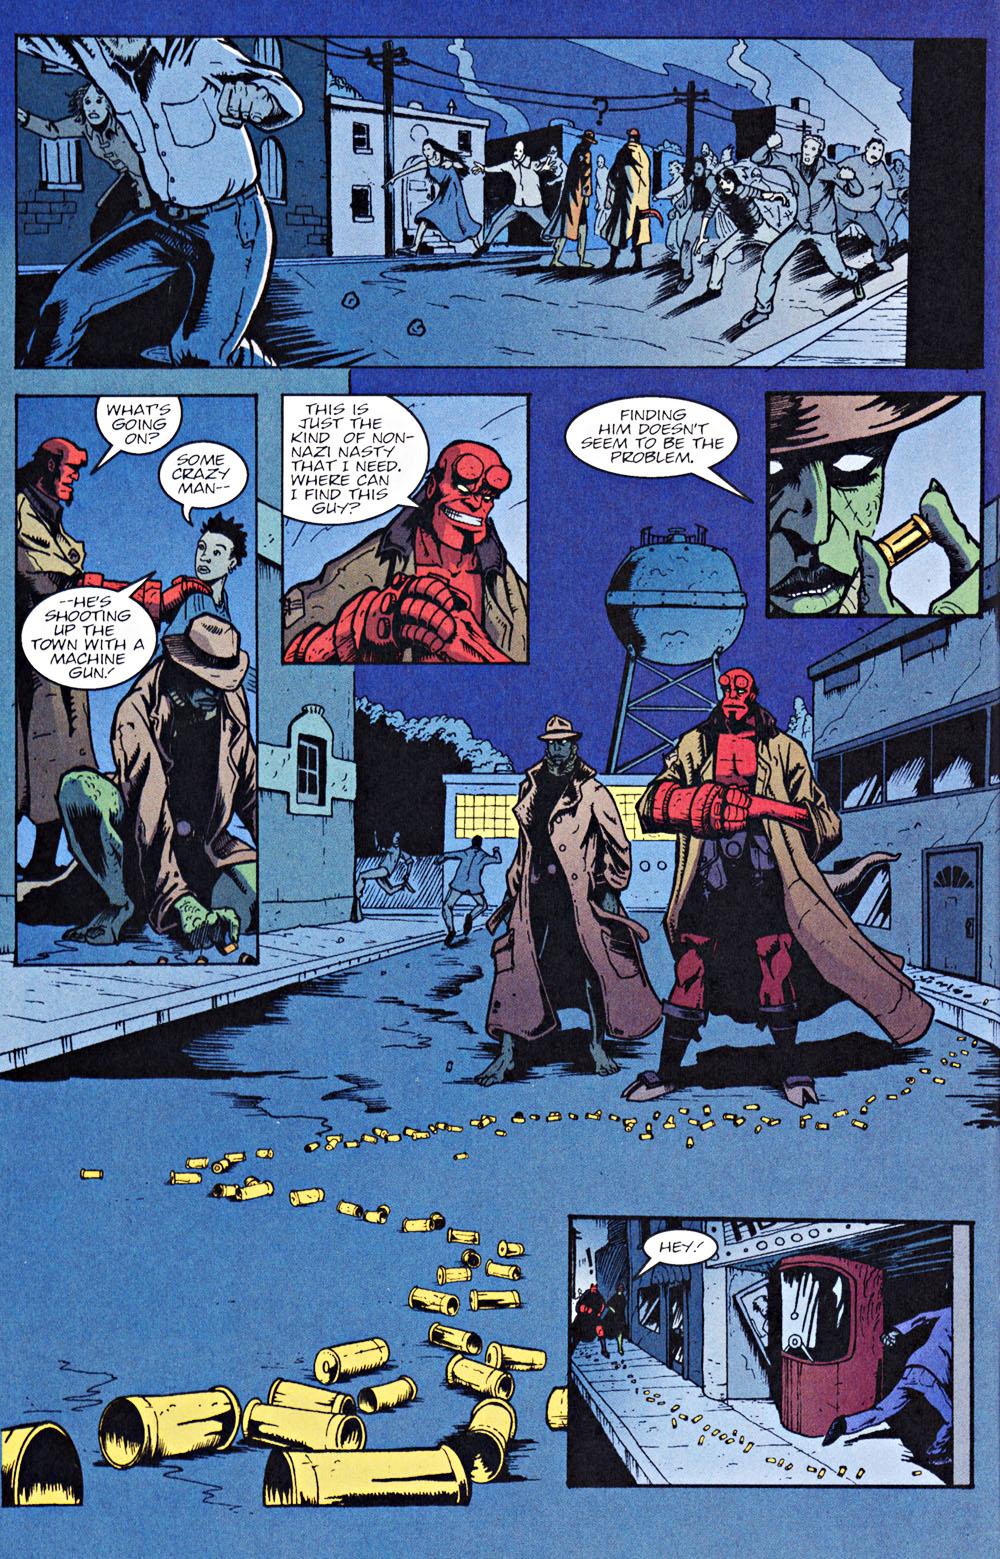 Read online Hellboy: Weird Tales comic -  Issue #7 - 12